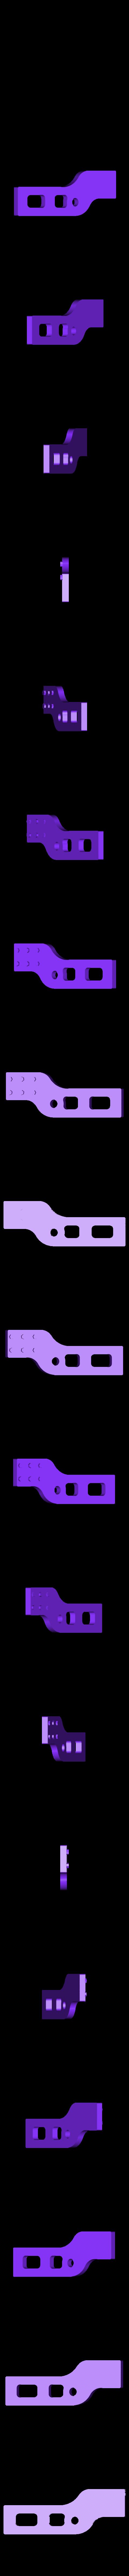 MirrorLink_Support_Frame-B.STL Download free STL file 4-8-8-4 Big Boy Locomotive • 3D printer object, RaymondDeLuca